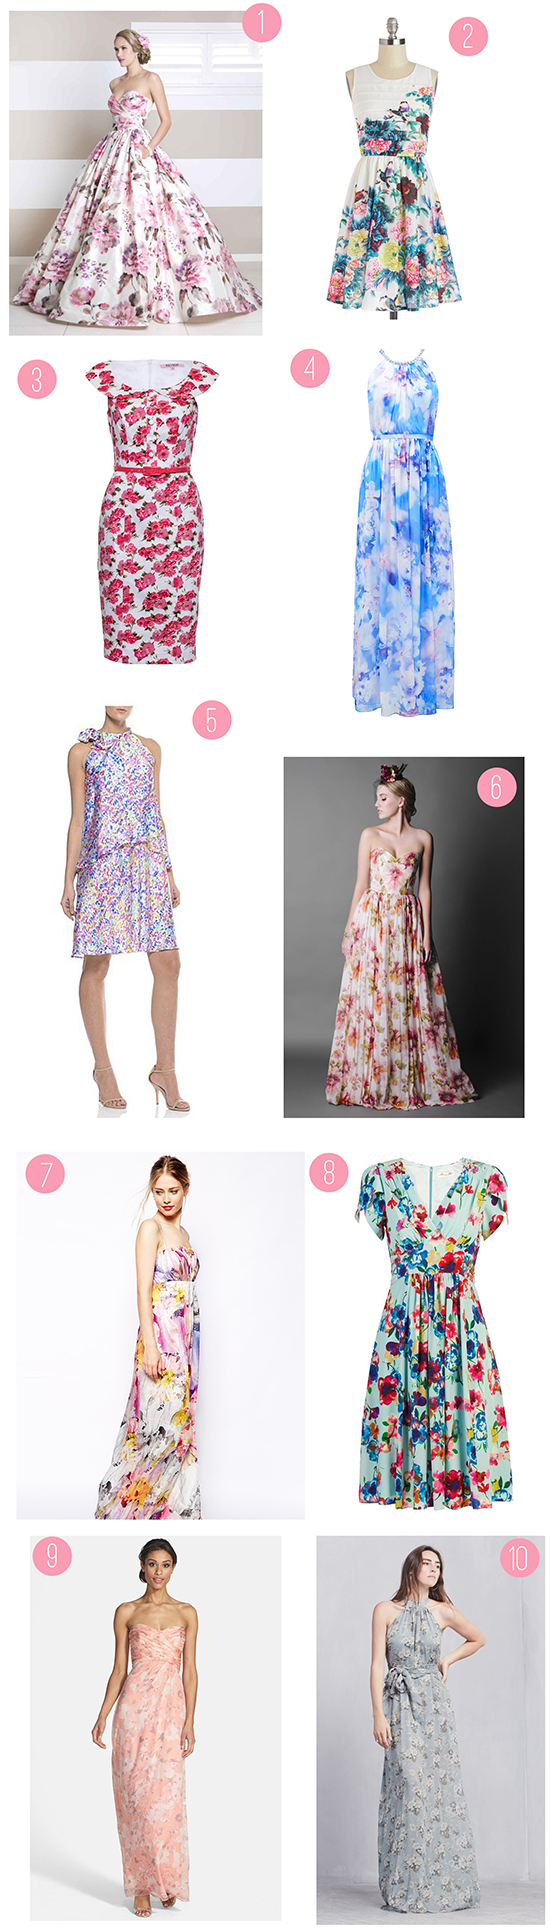 floral printed dresses 10 Floral Print Dresses I Adore